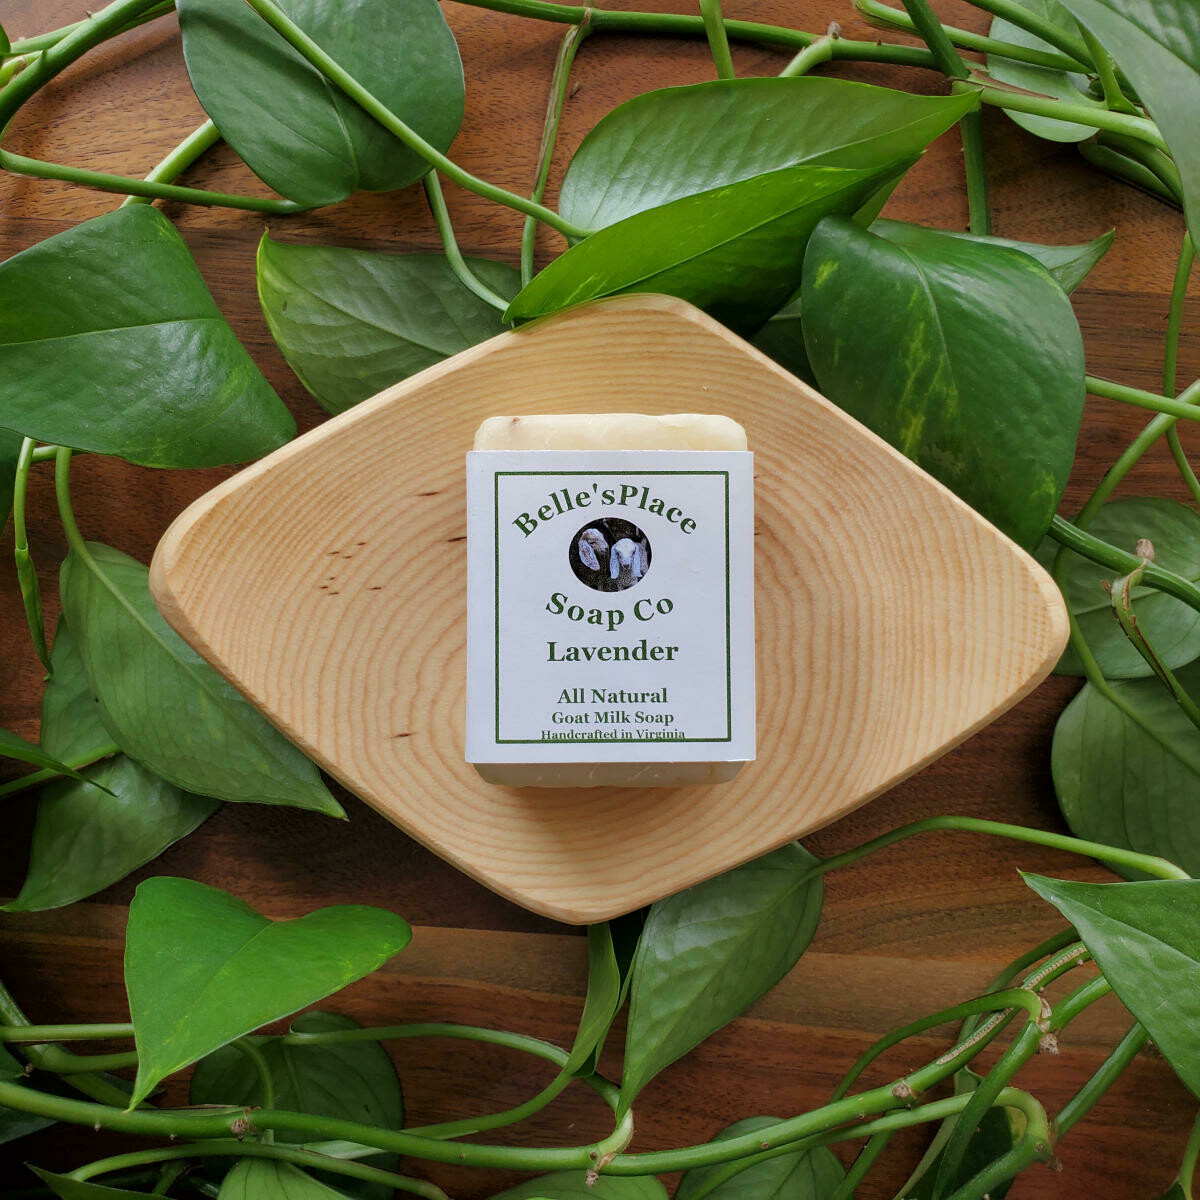 Belle's Place Soap Co. All-Natural Goat Milk & Shea Butter Soap